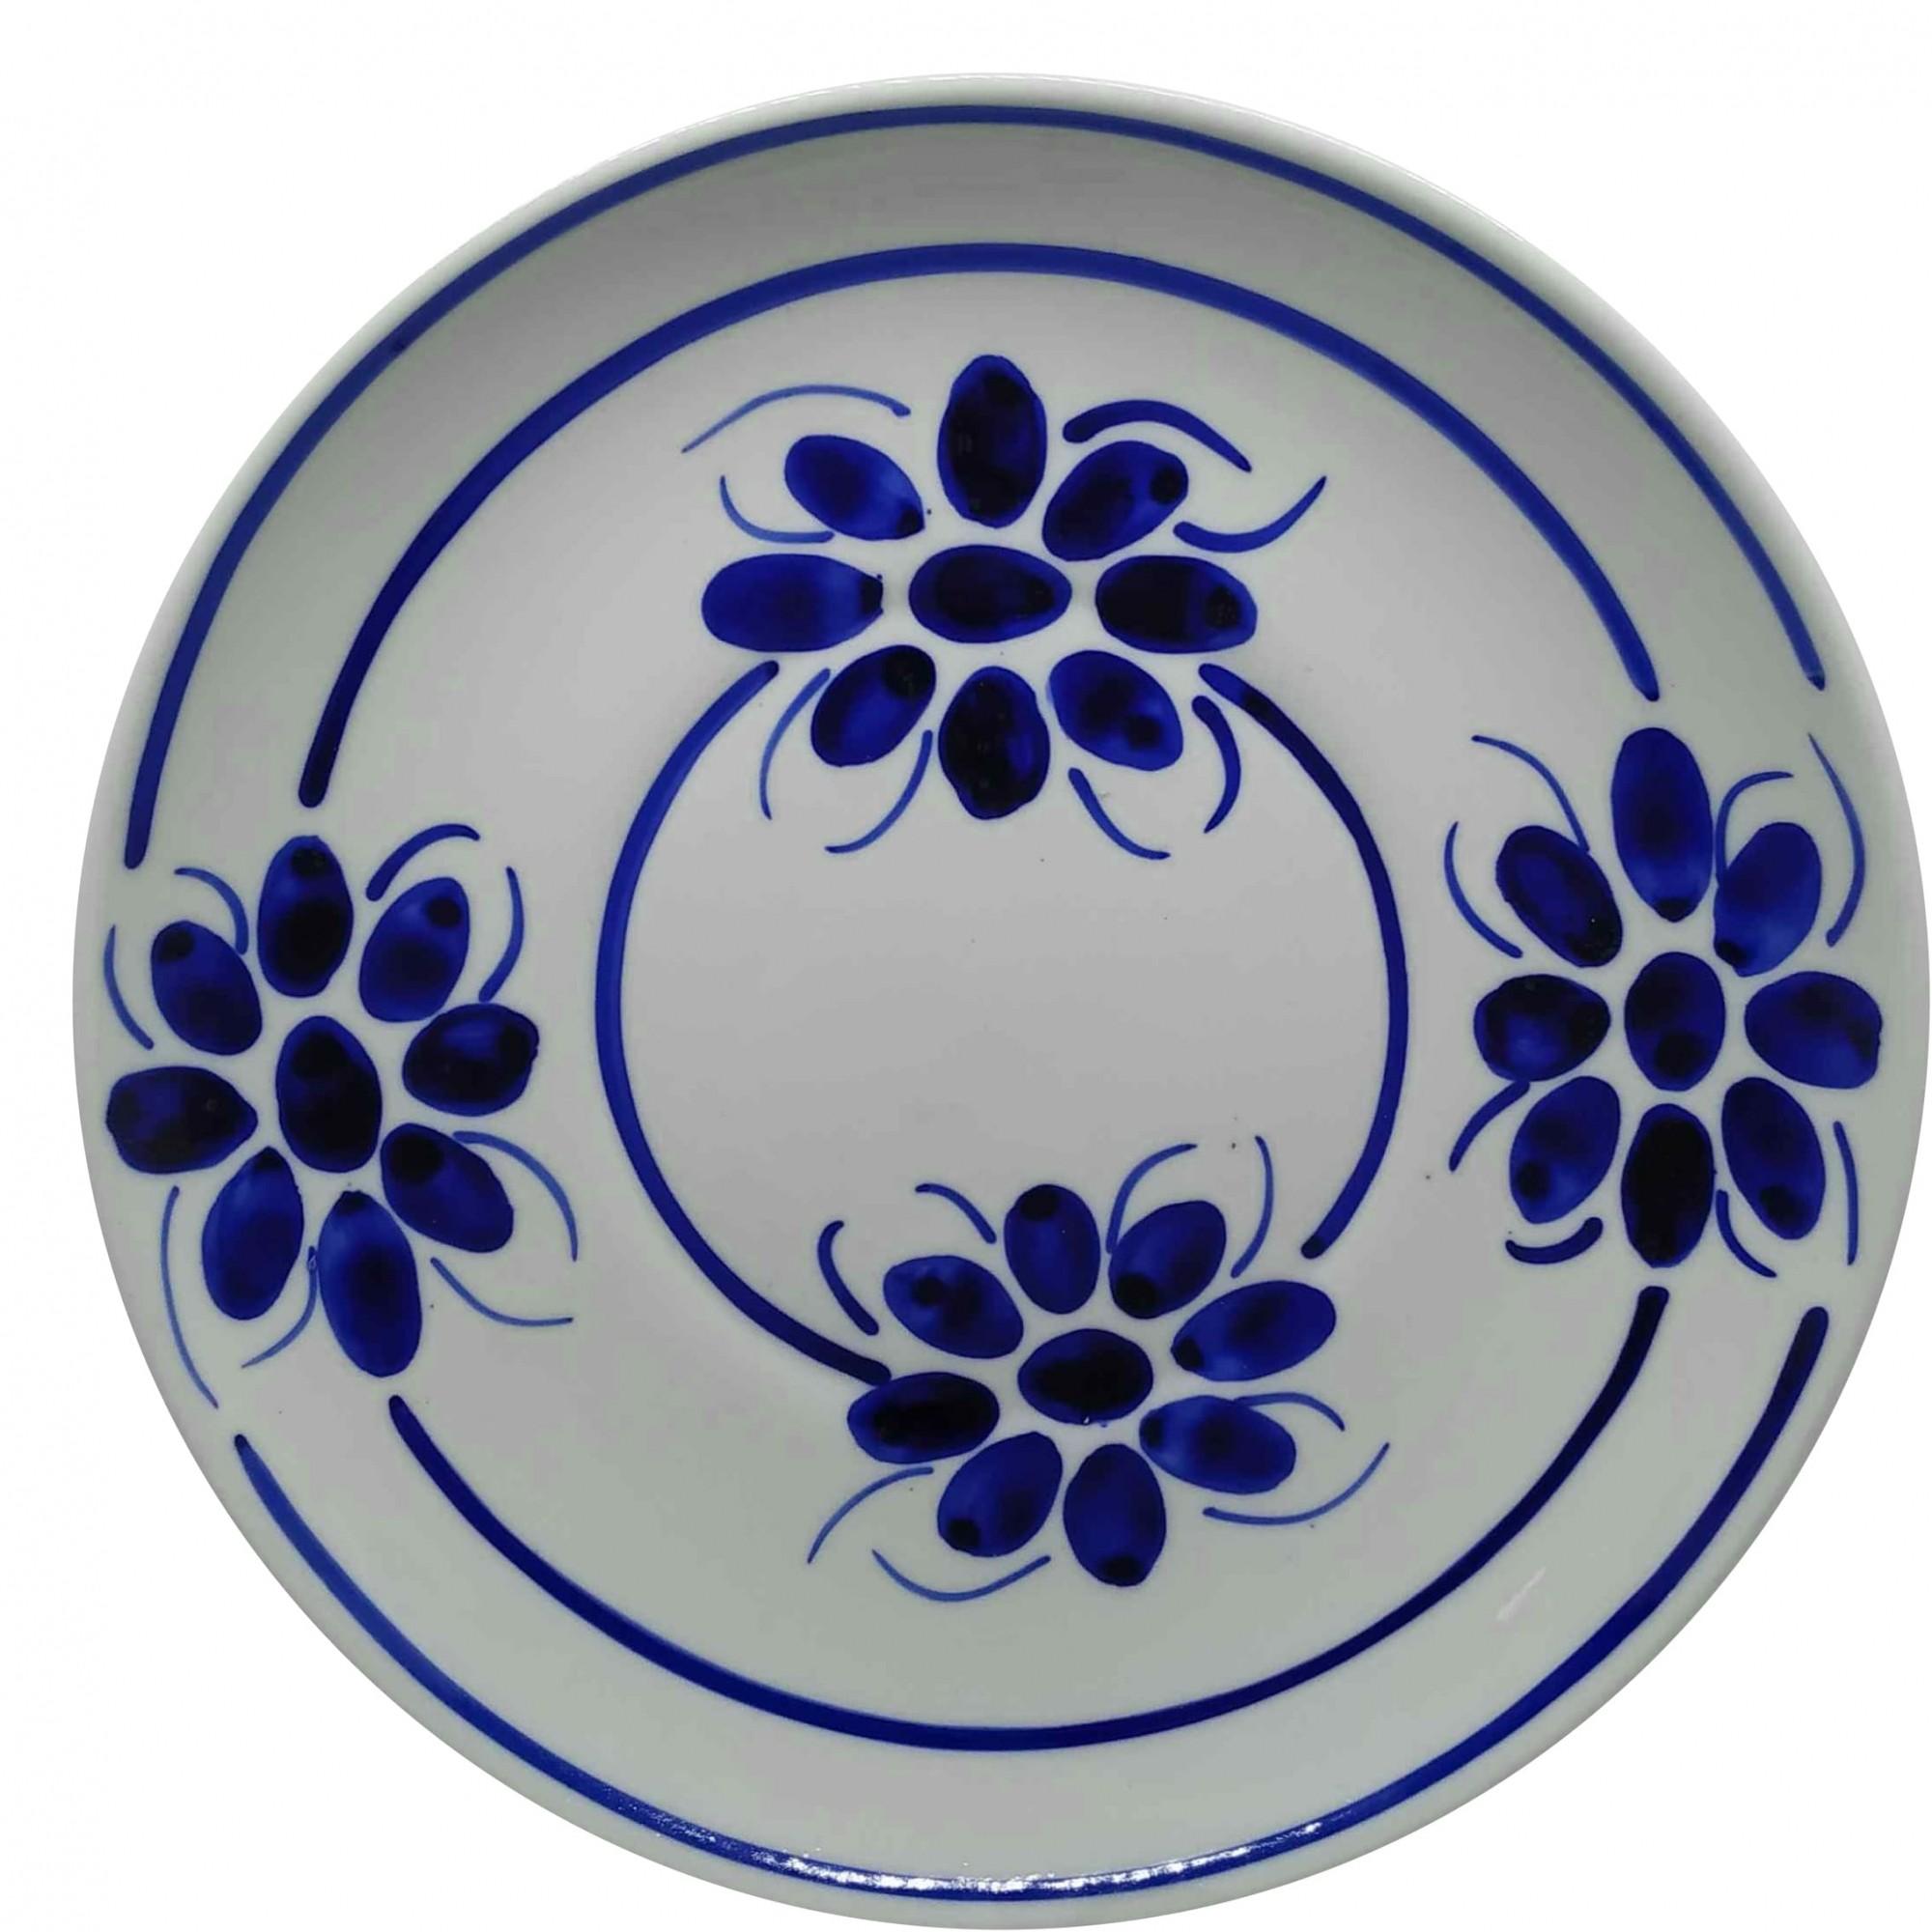 Prato Raso 26,5 cm Porcelana Azul Floral